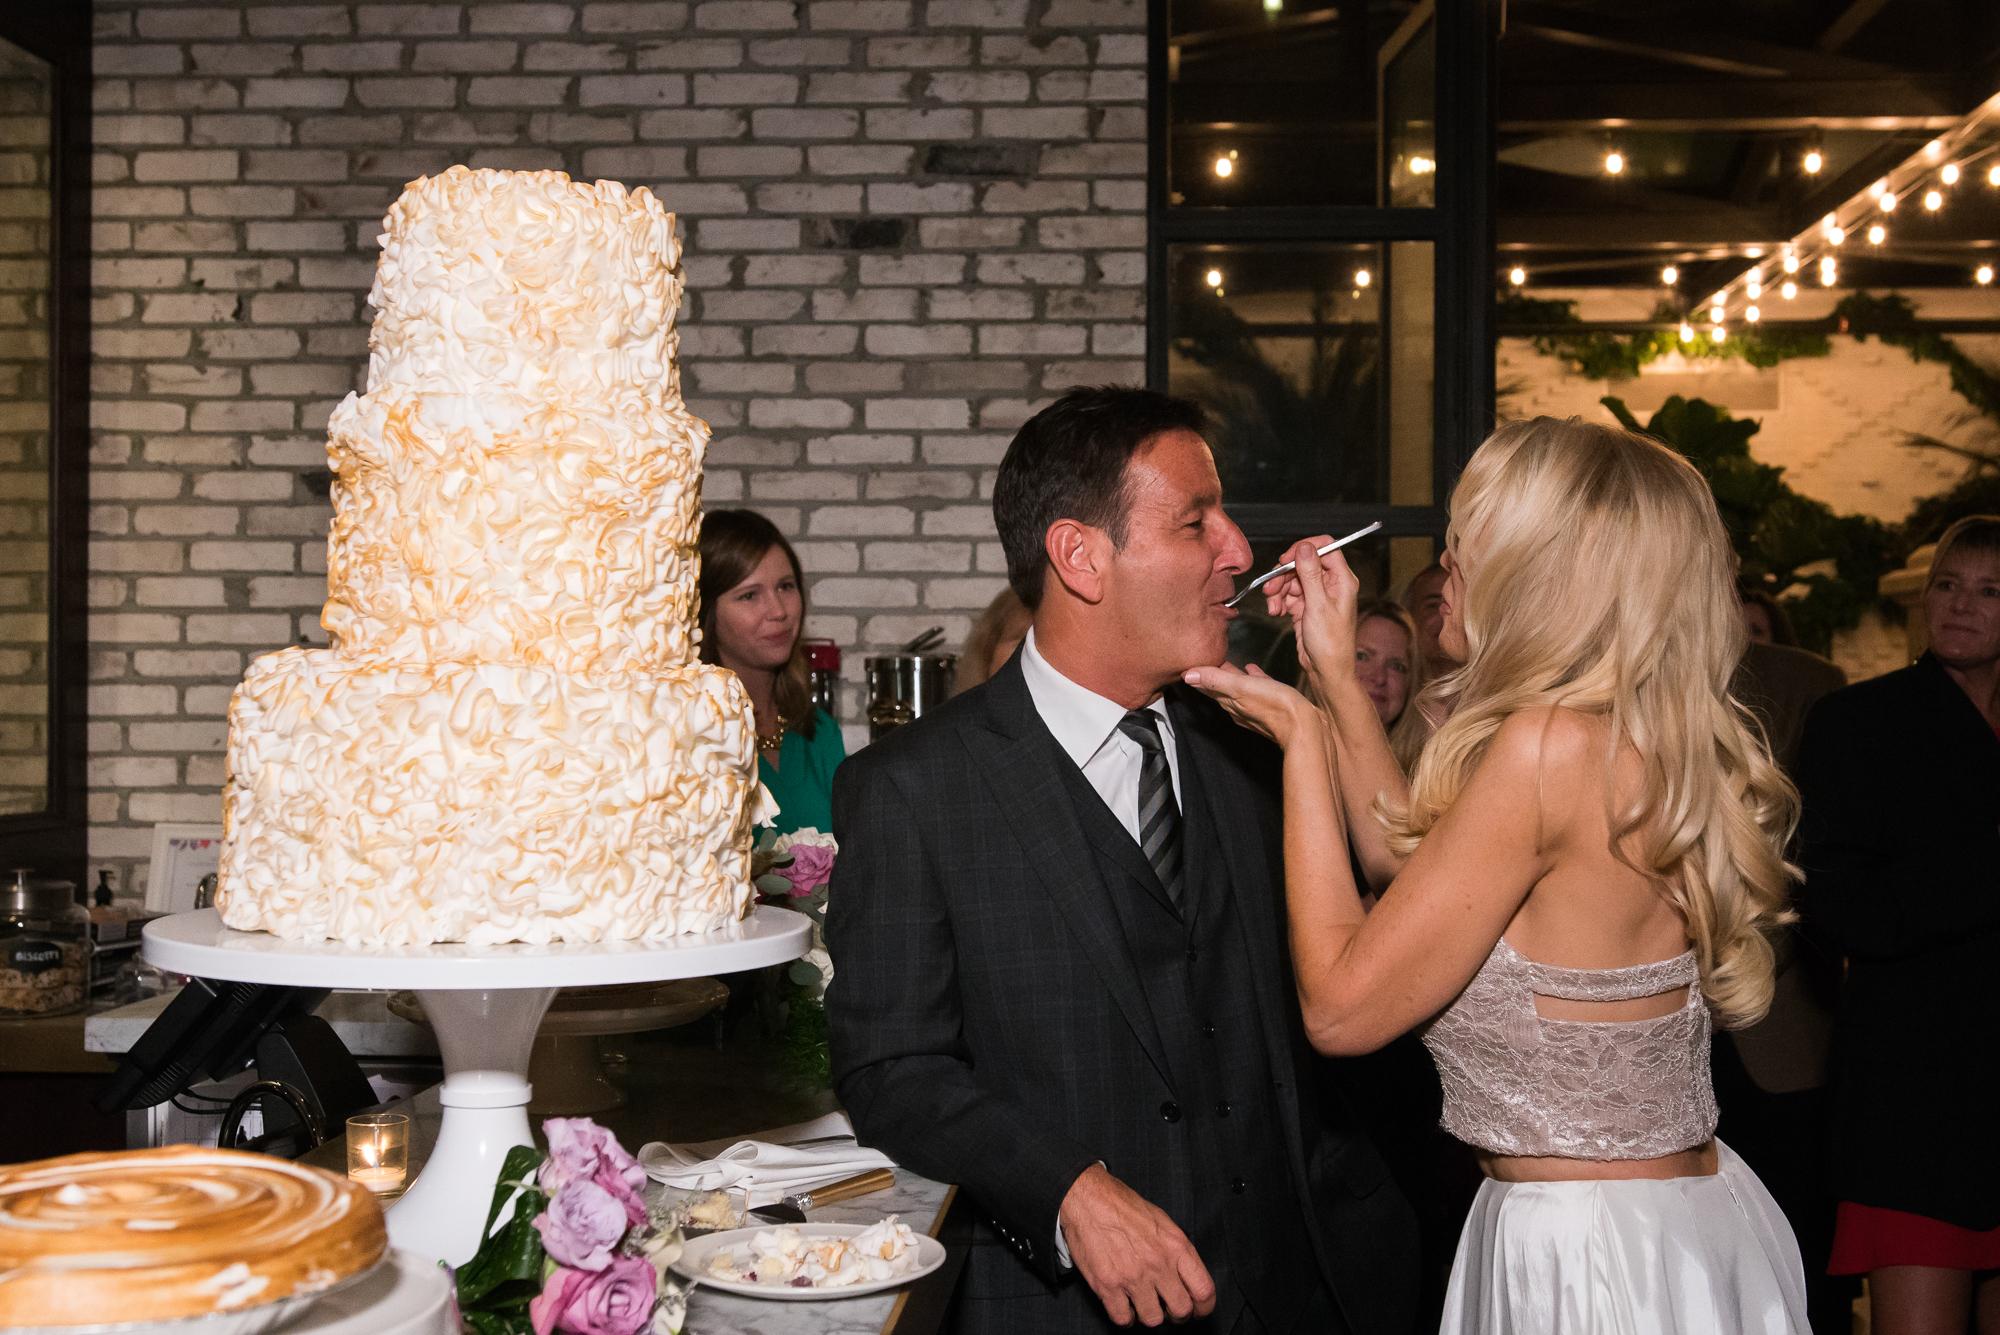 Dawn+Stephen-795.jpgOxford-Exchange-wedding-cake, Chocolate-Pi-cake